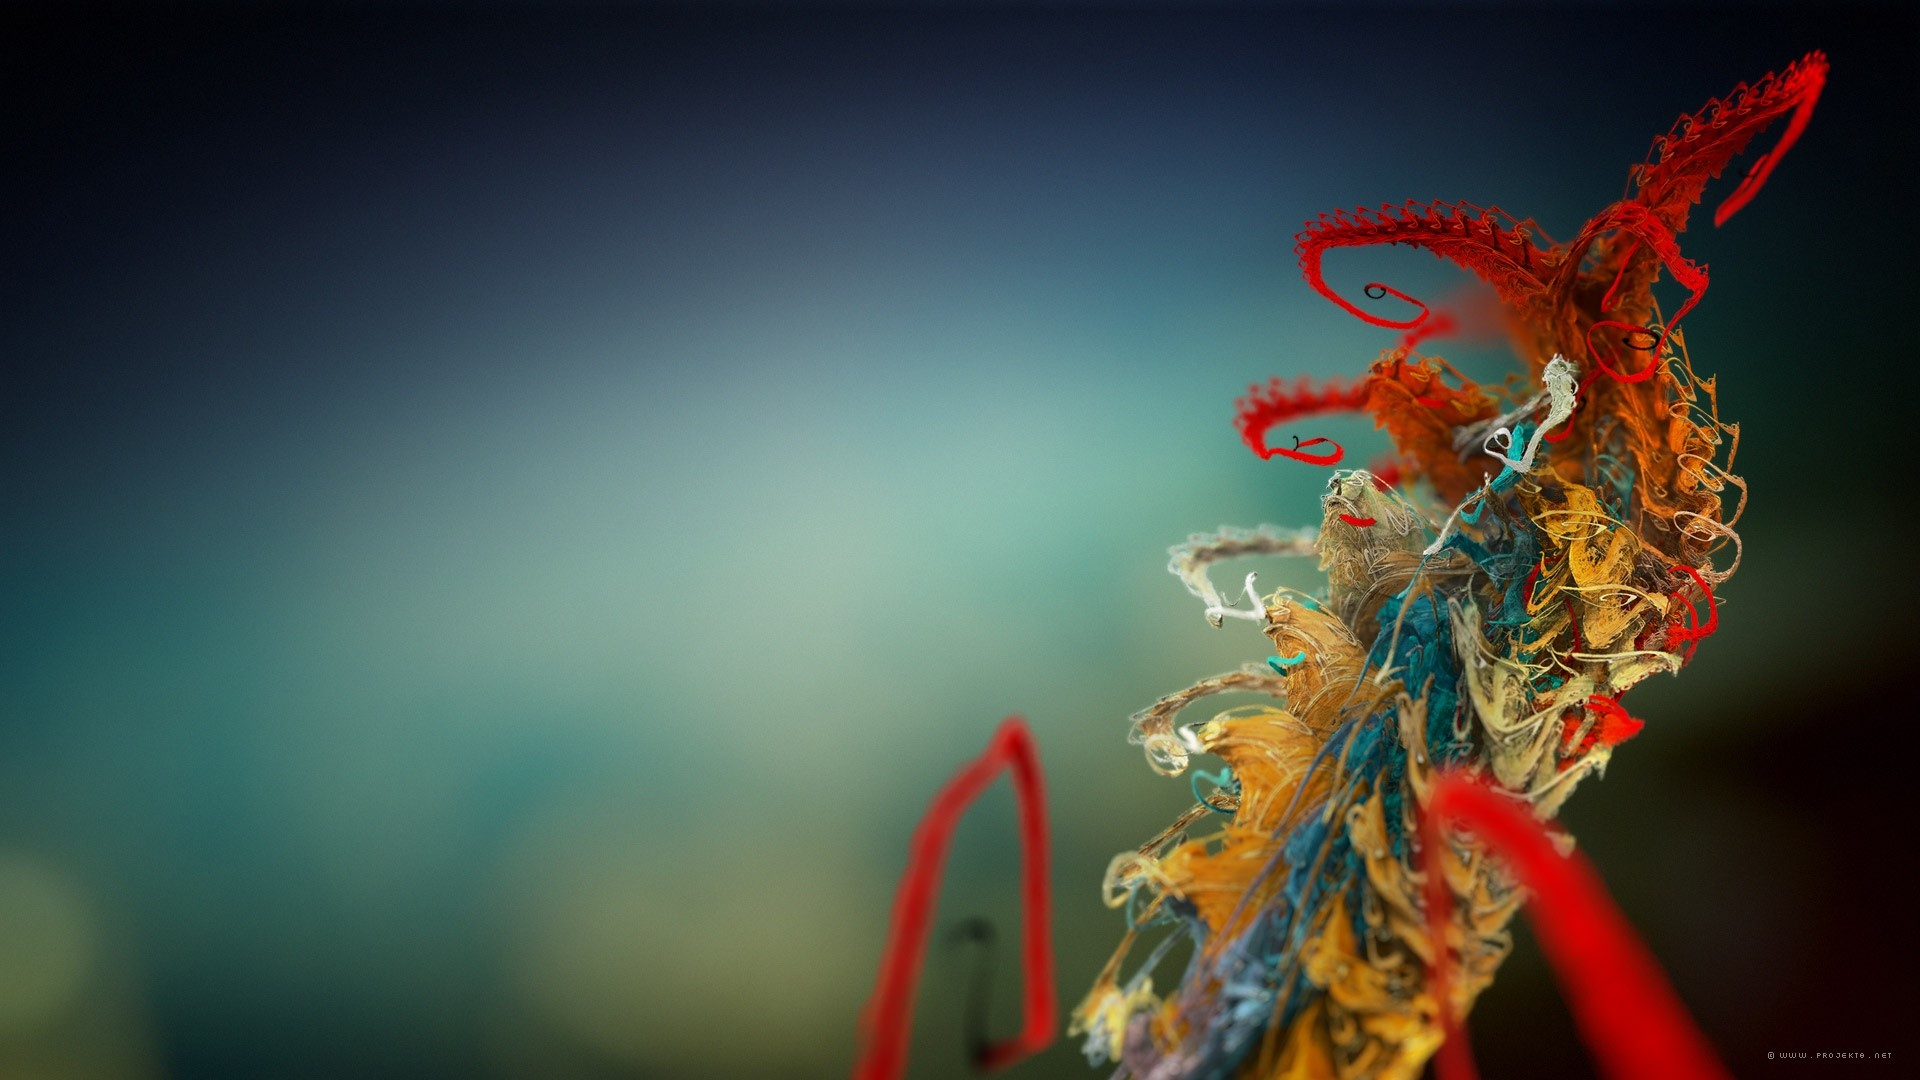 Wallpaper Microscopic plant